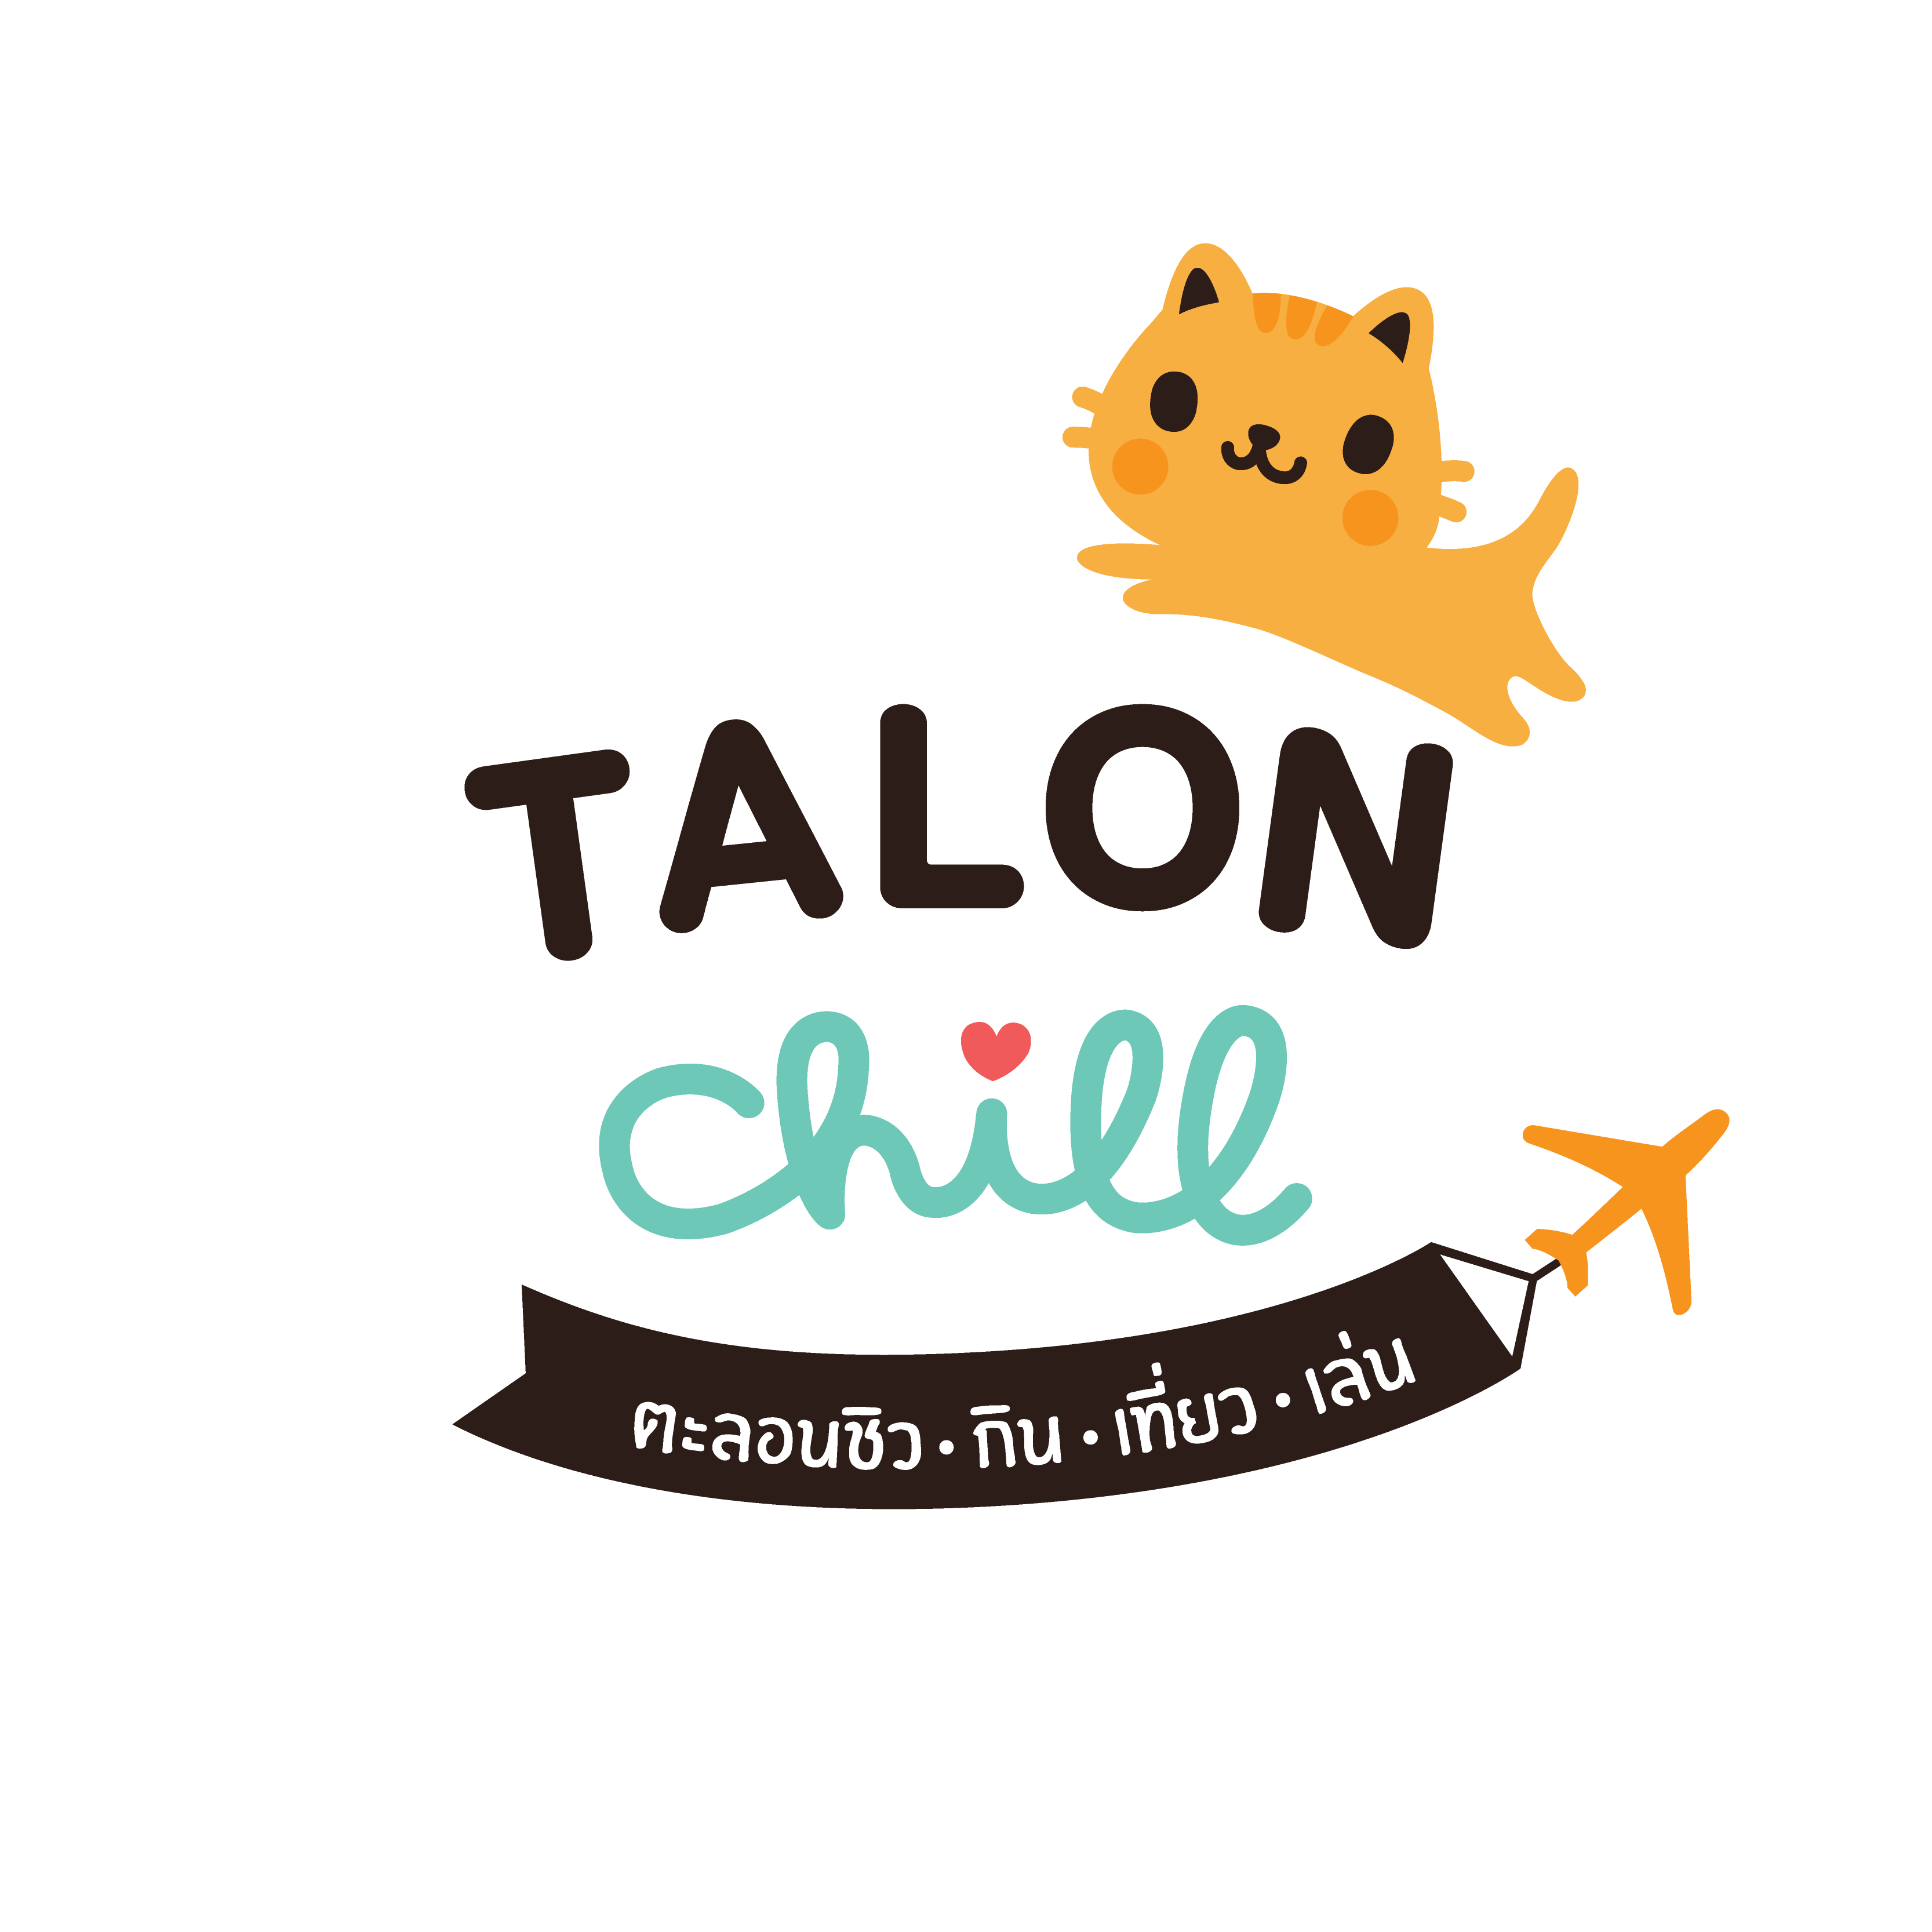 talonchill.com ตะลอนชิว กิน-เที่ยว-เล่น รีวิวทุกสิ่งทุกอย่างบนโลกใบนี้